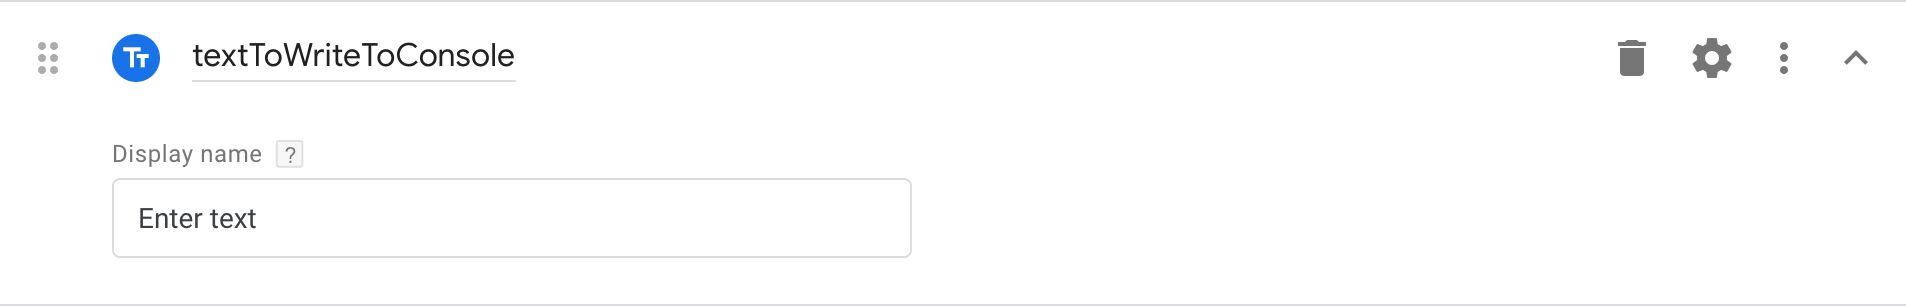 Custom Templates Guide For Google Tag Manager   Simo Ahava's blog